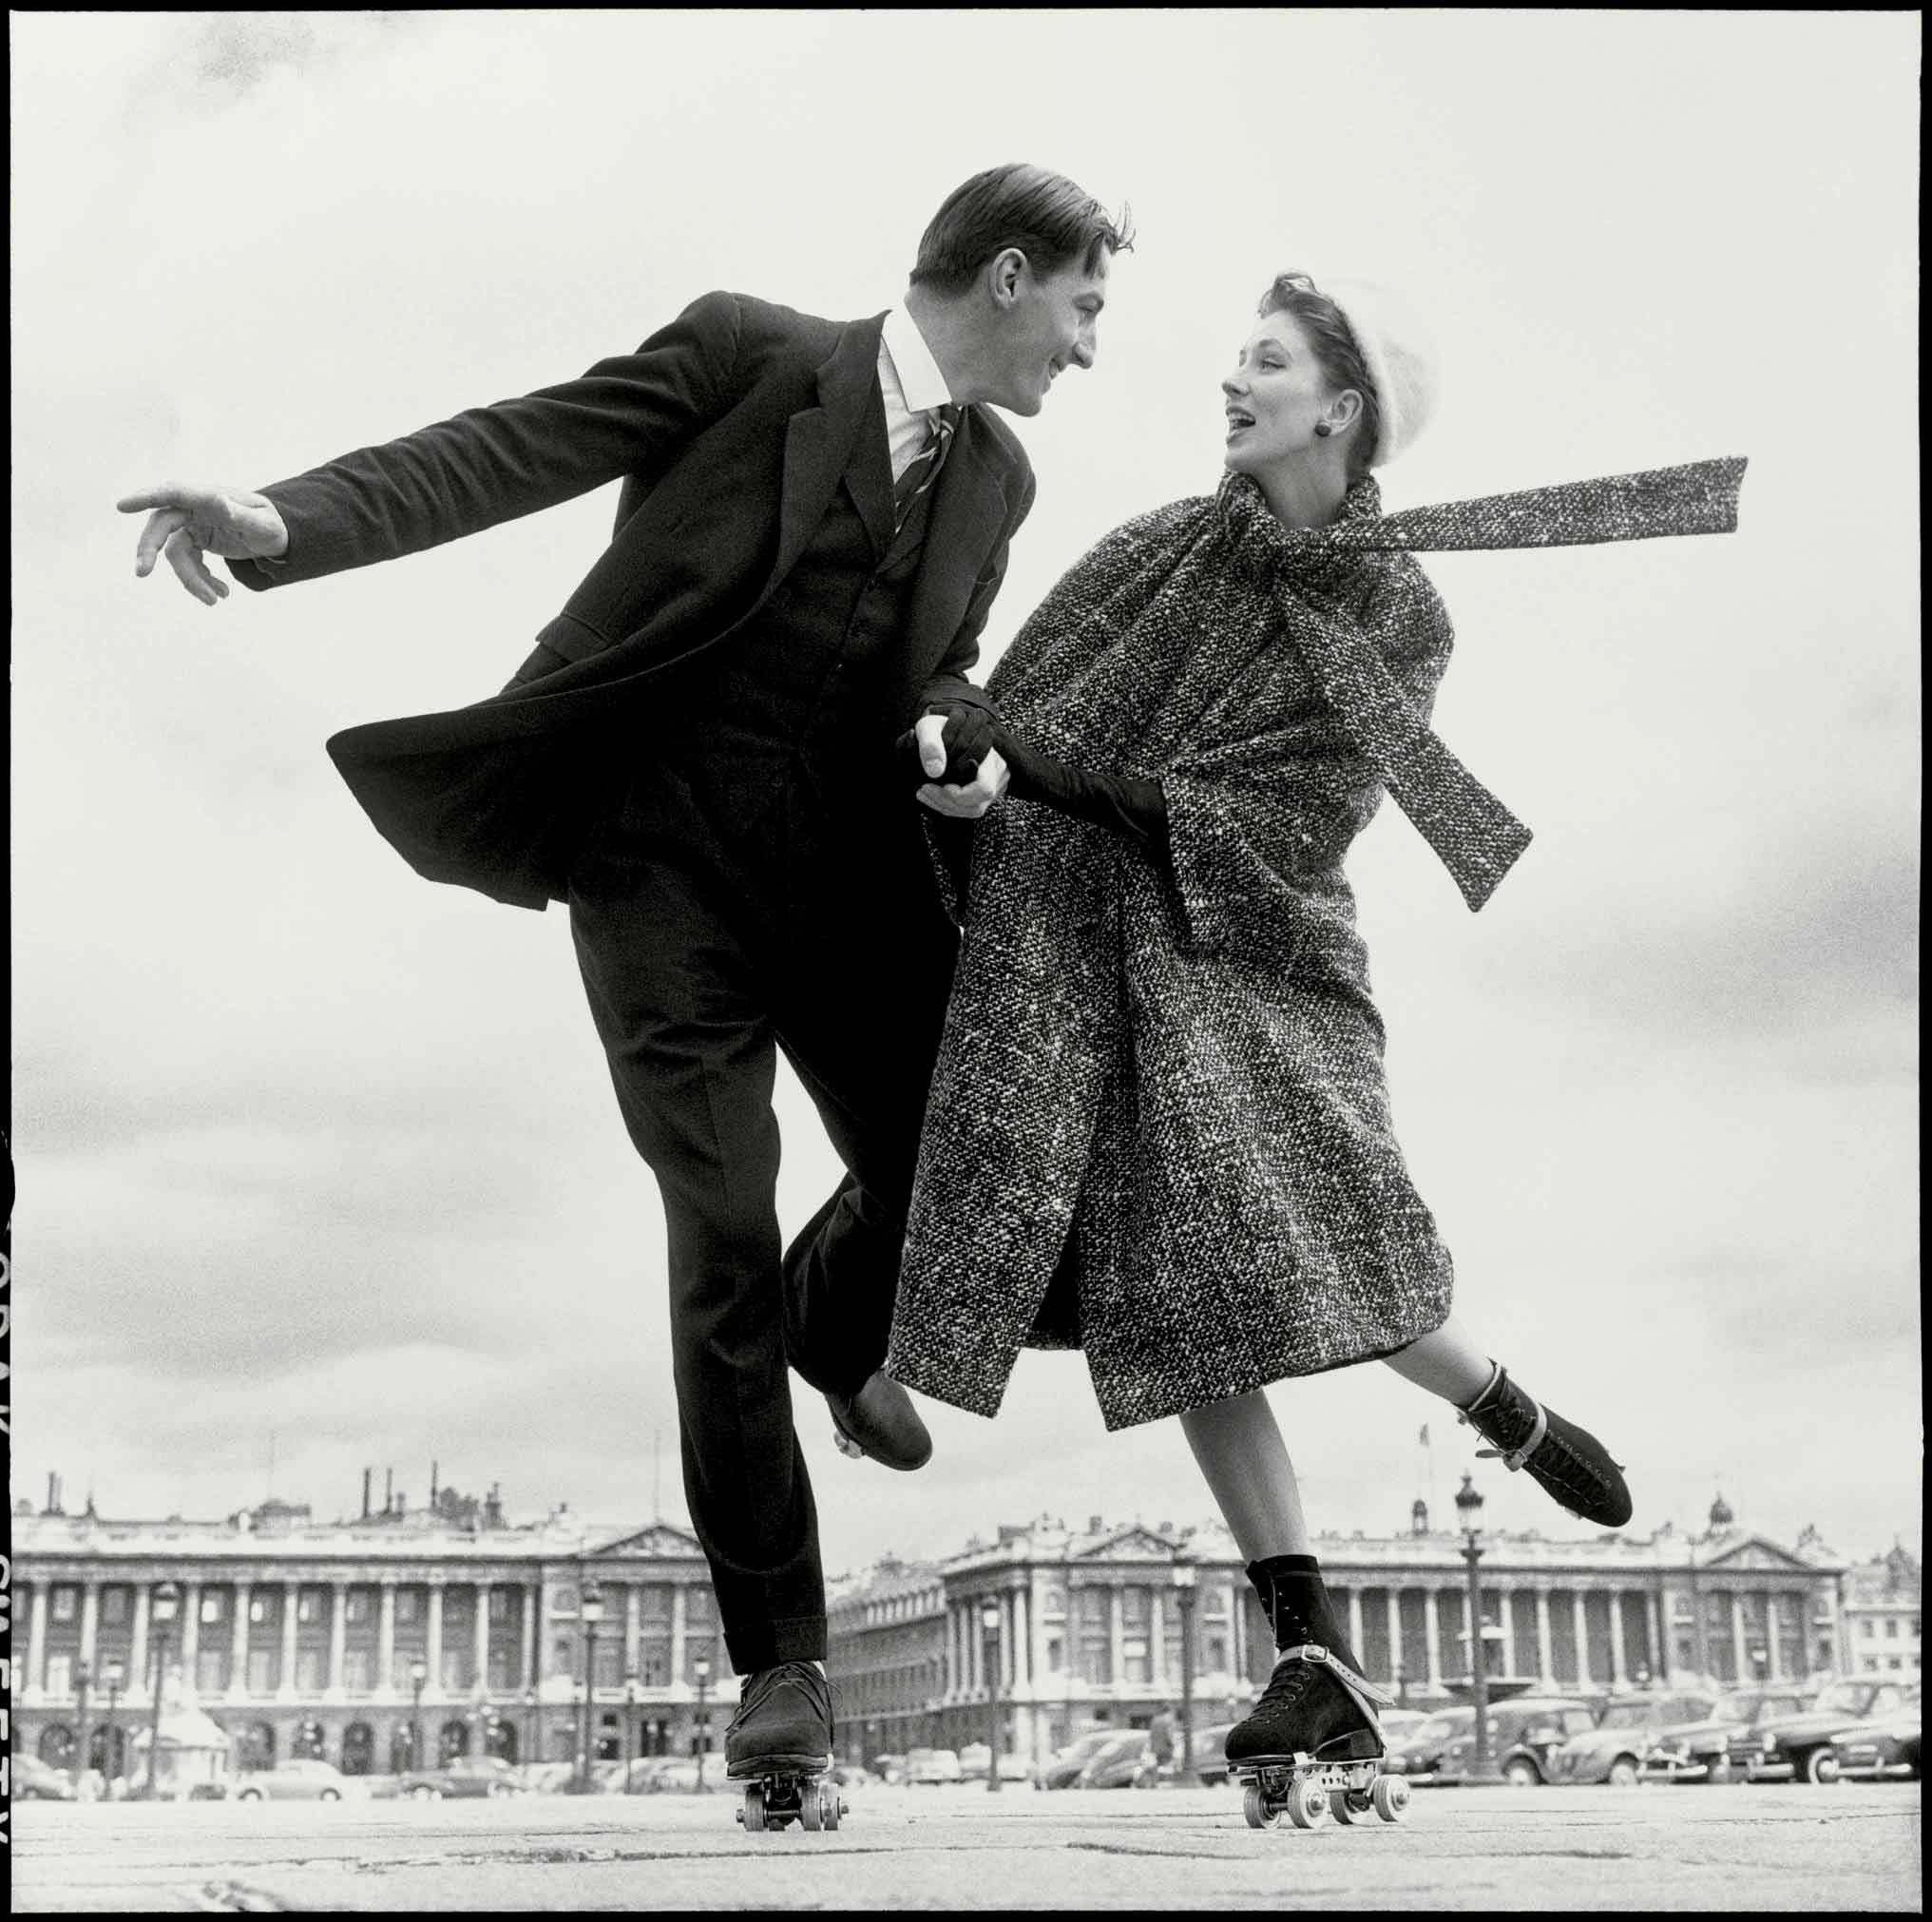 Suzy Parker and Robin Tattersall, Dress by Dior, Place de la Concorde, Paris, August 1956